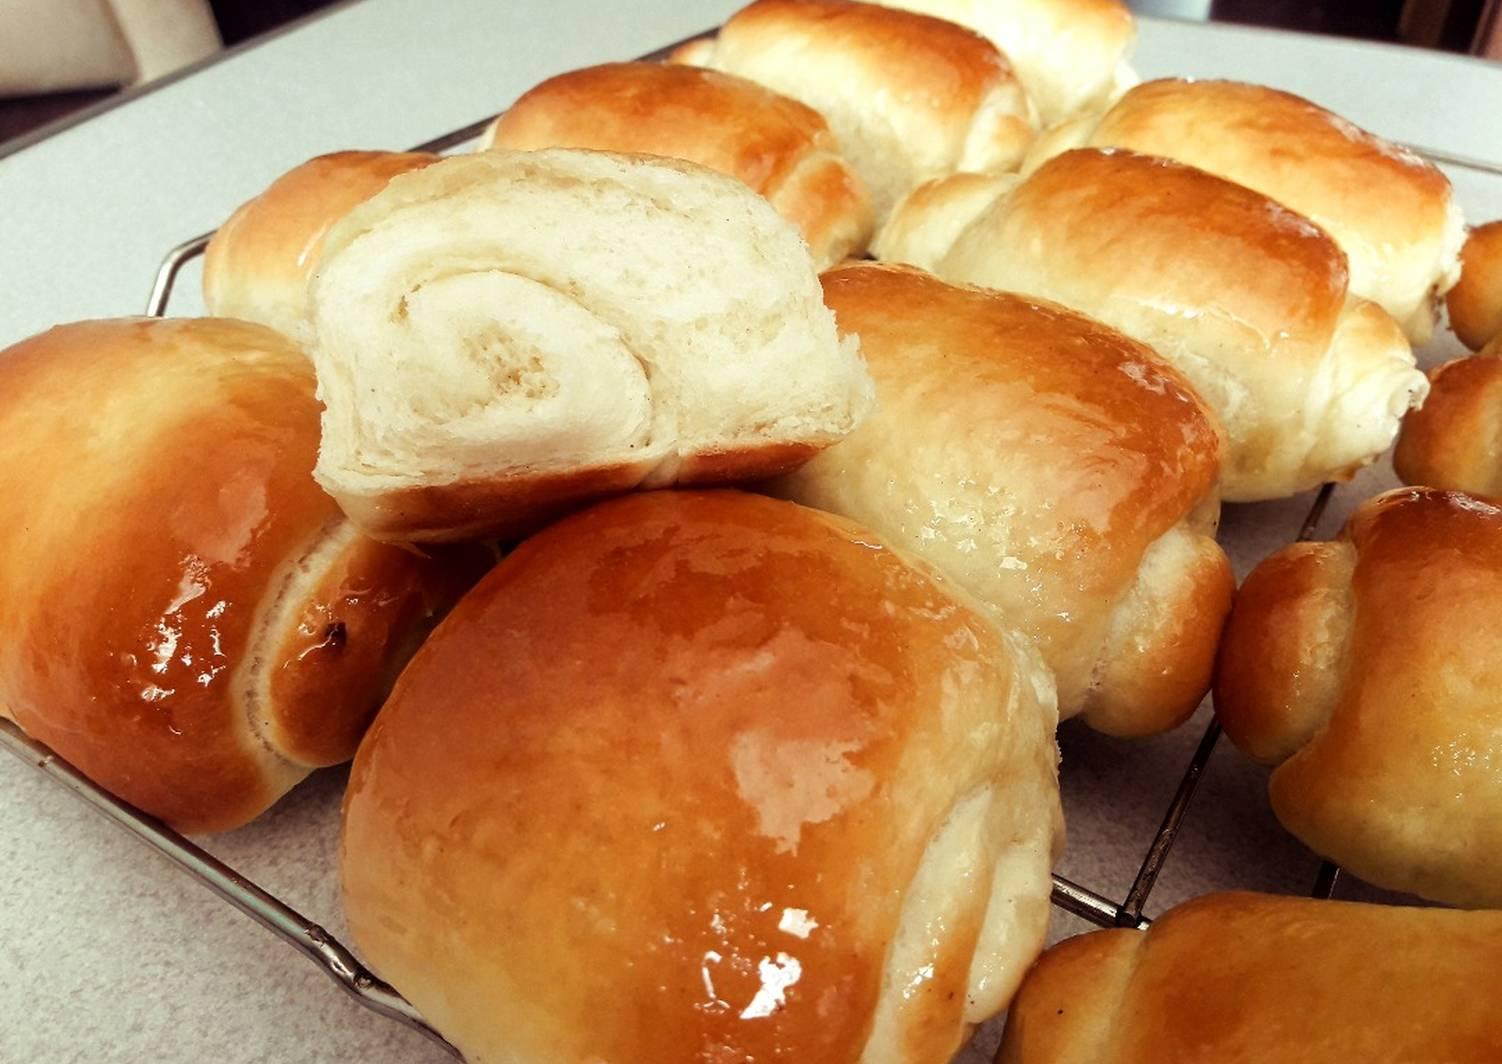 нежные булочки рецепт фото метод анализа